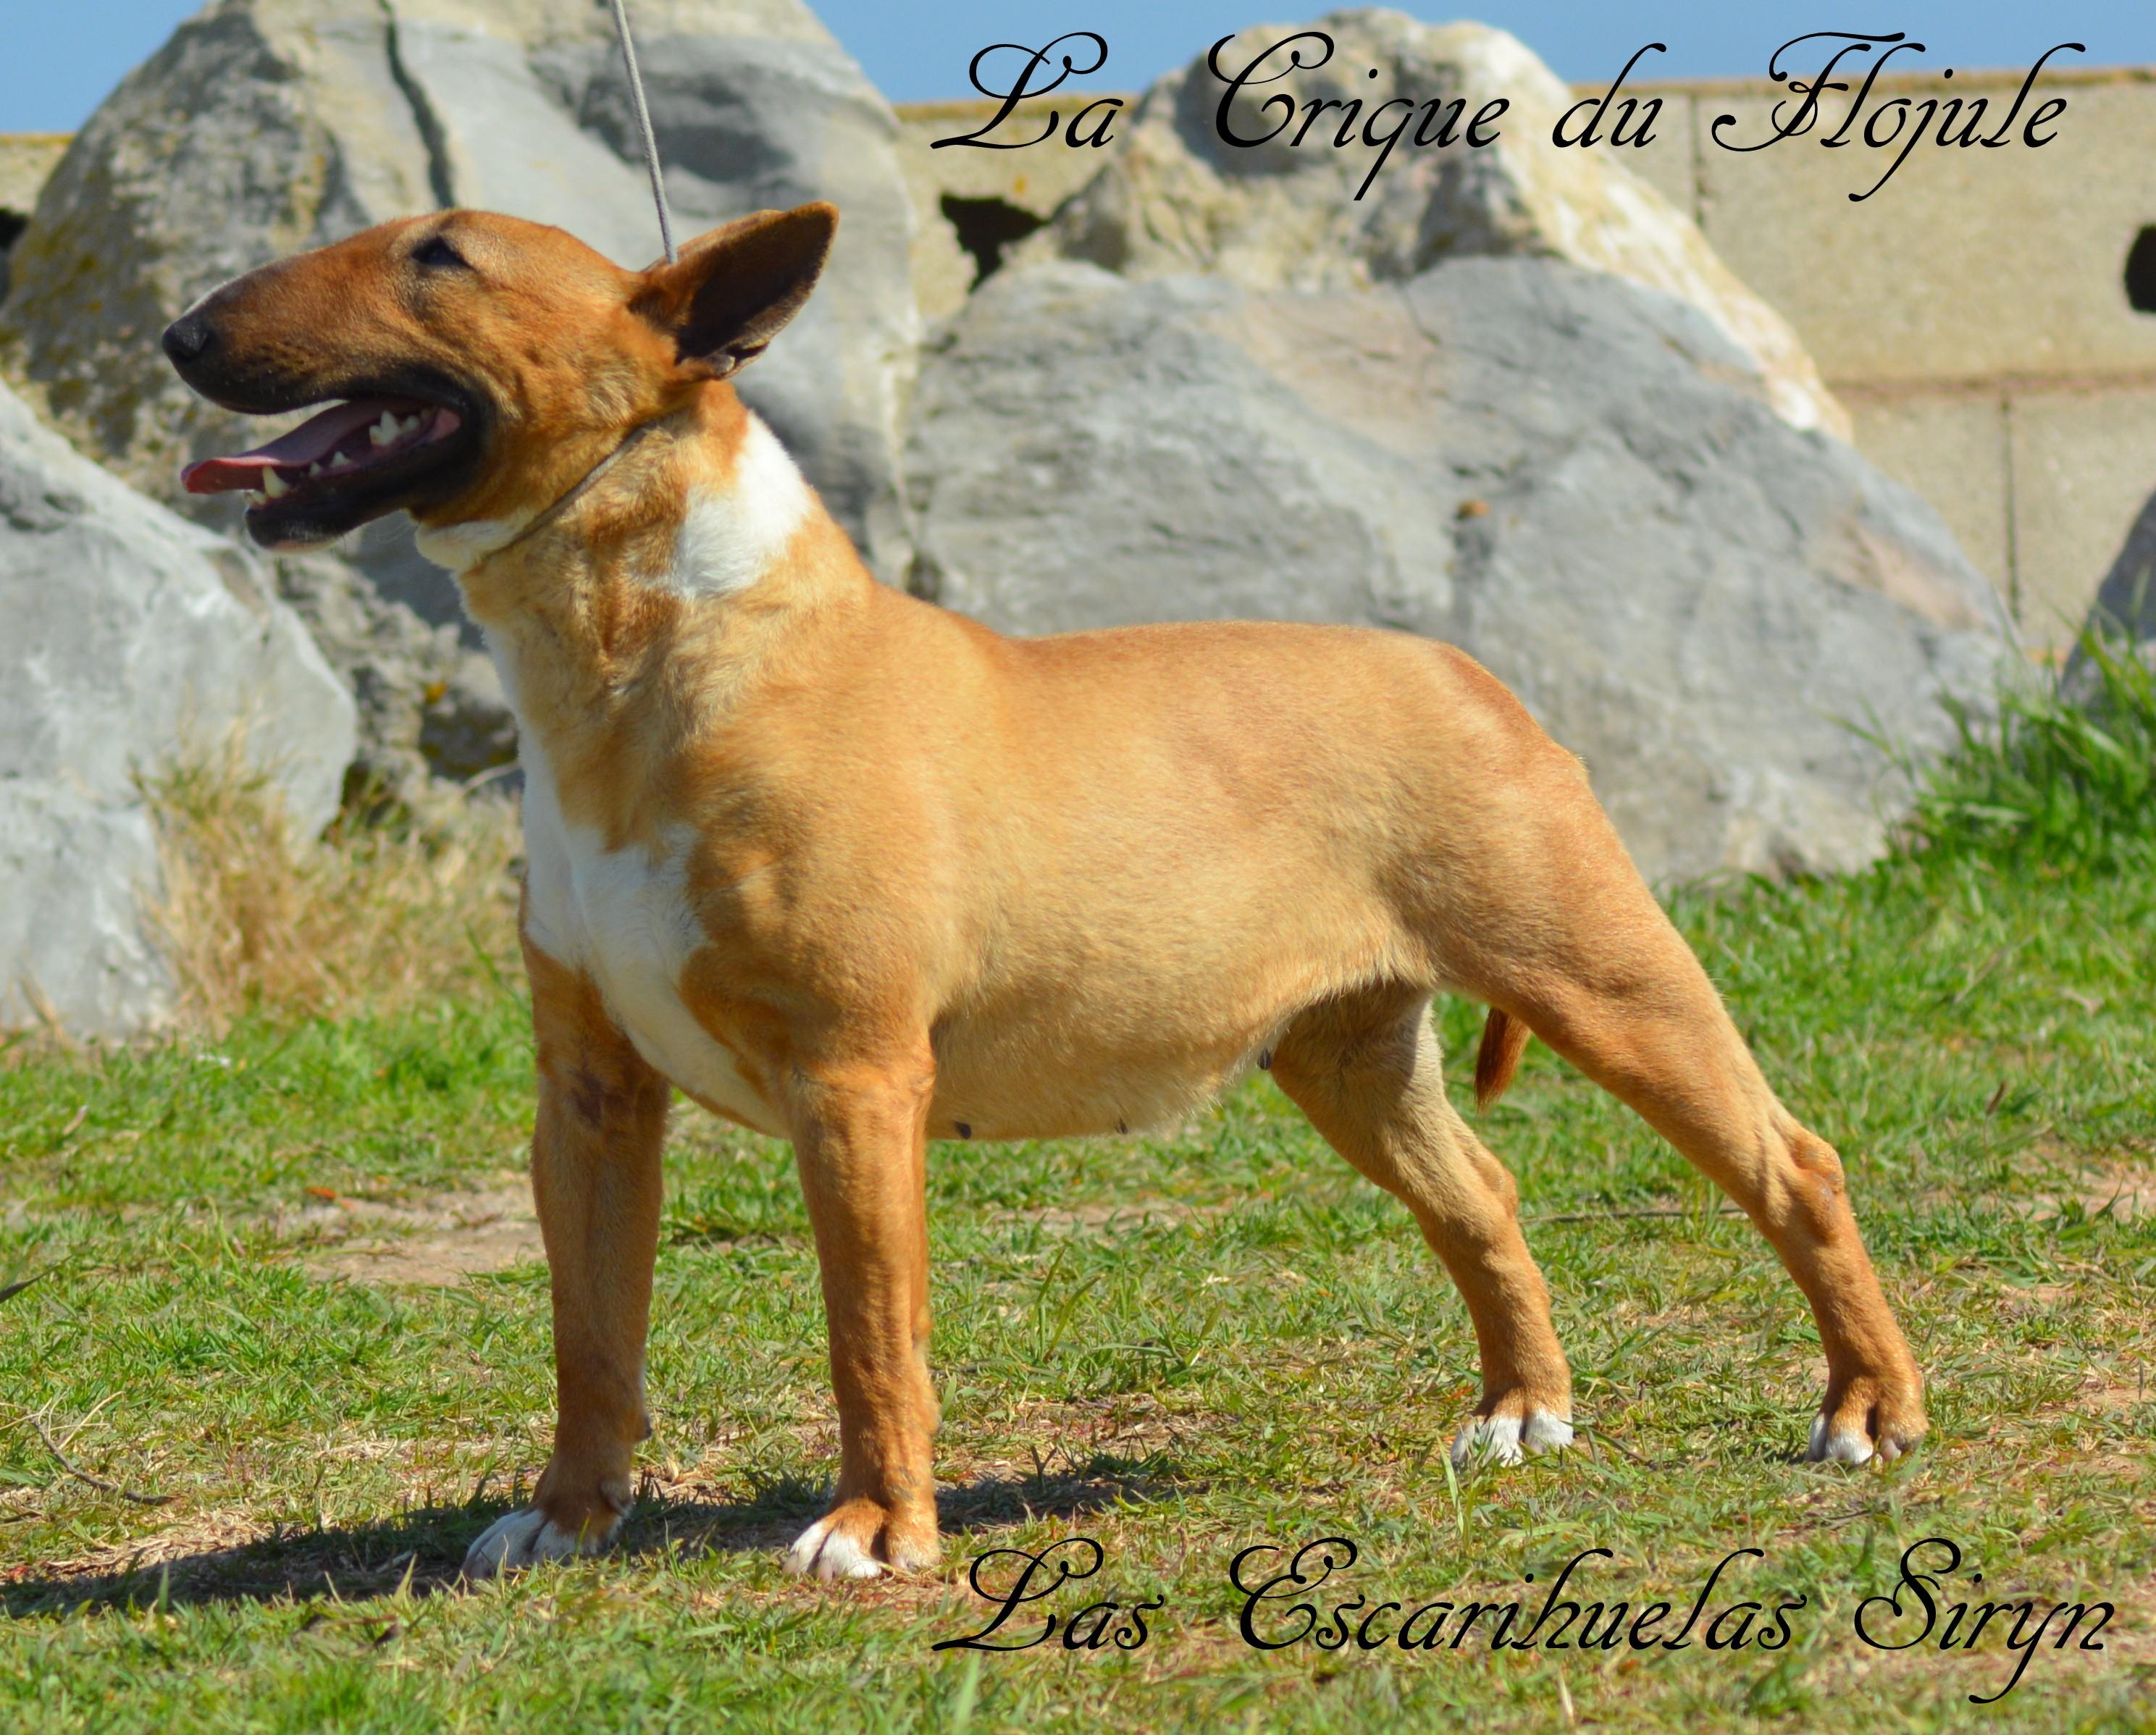 Les Bull Terrier Miniature de l'affixe De la crique du Flojule